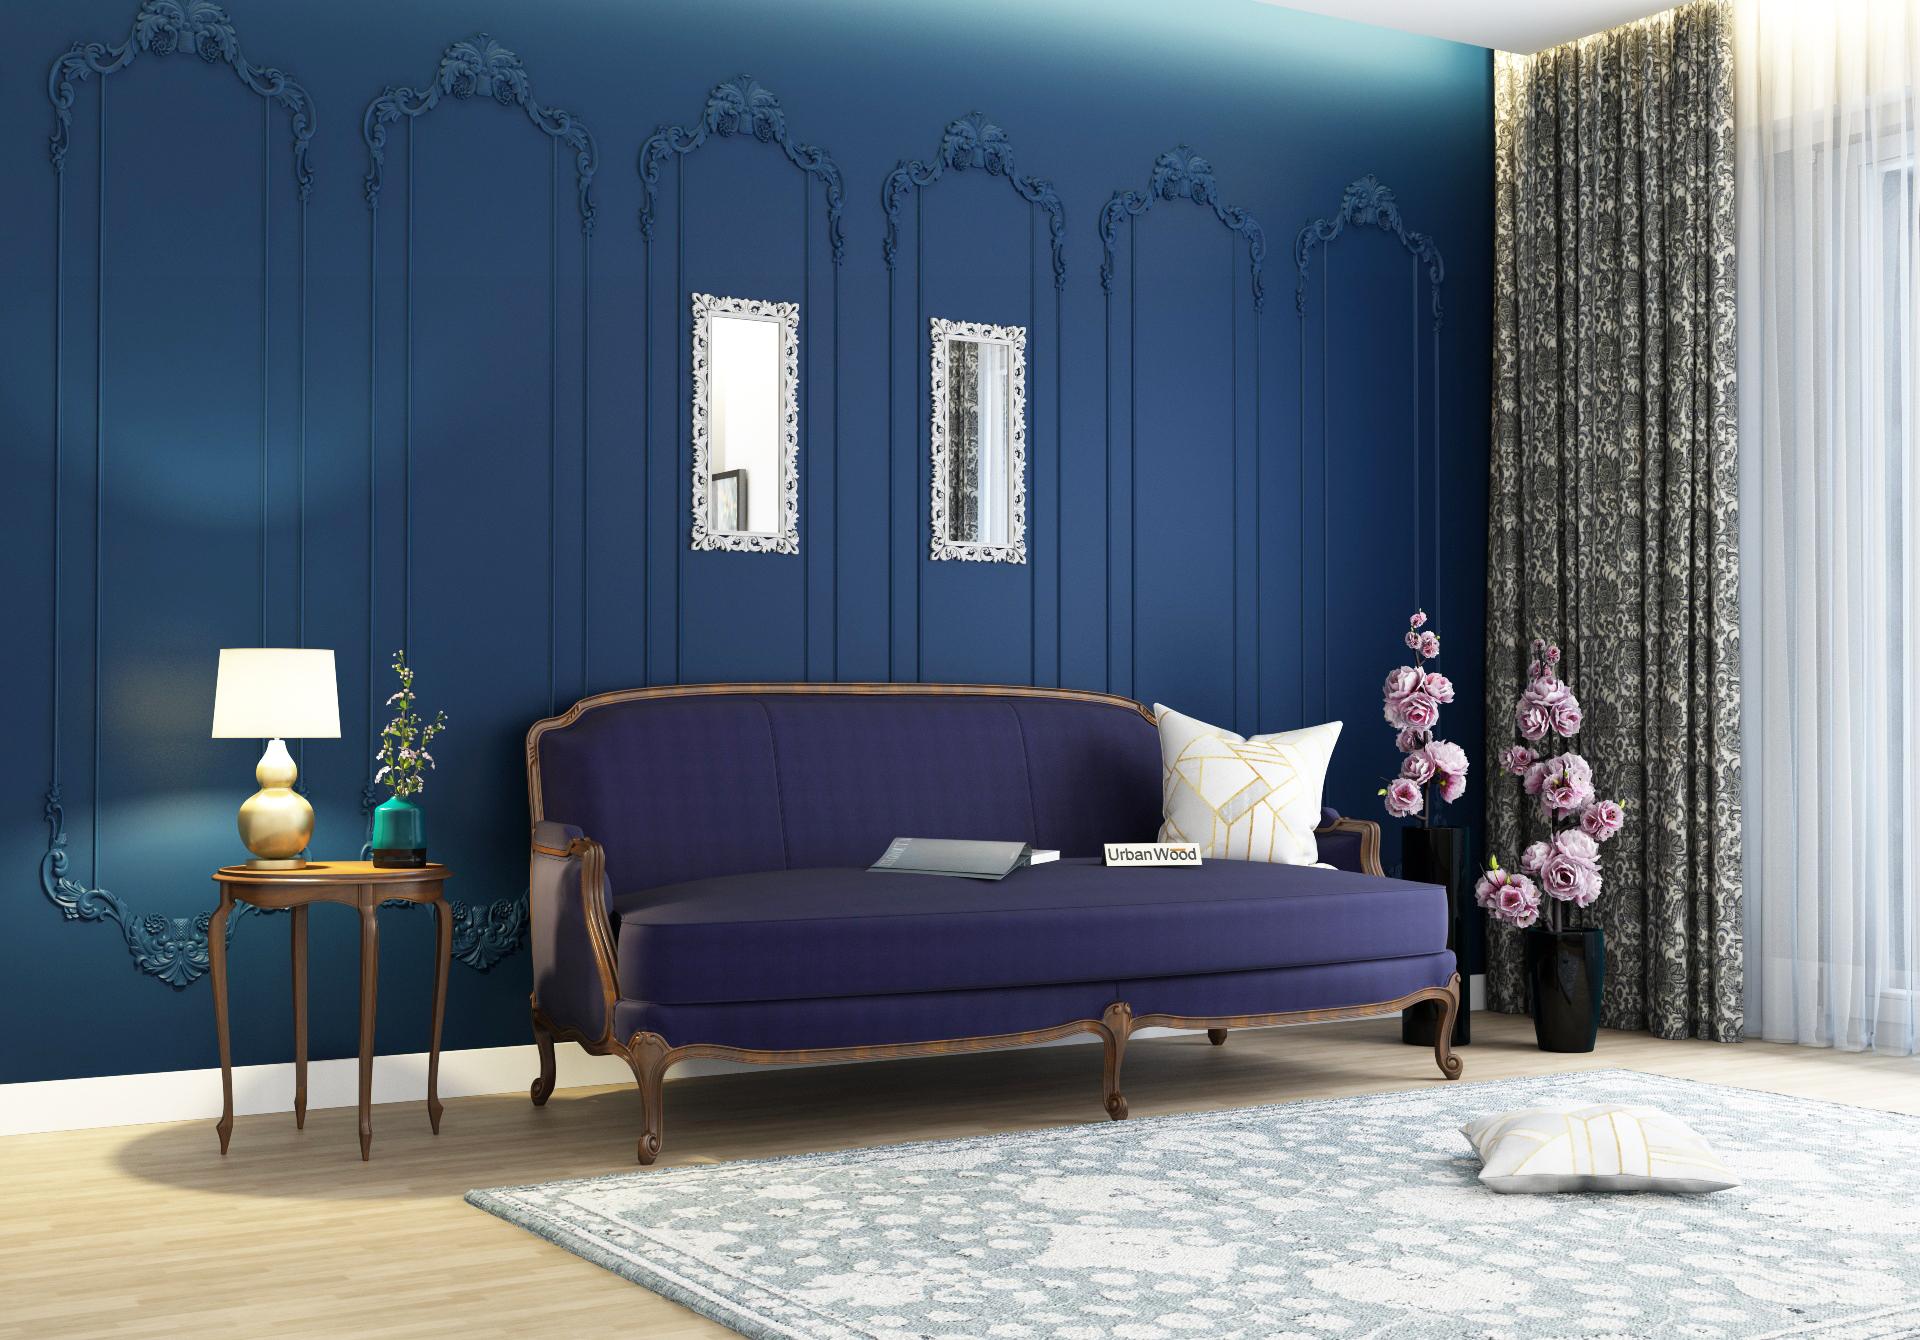 Abro 3 Seater Sofa <small>(Cotton, Navy blue)</small>